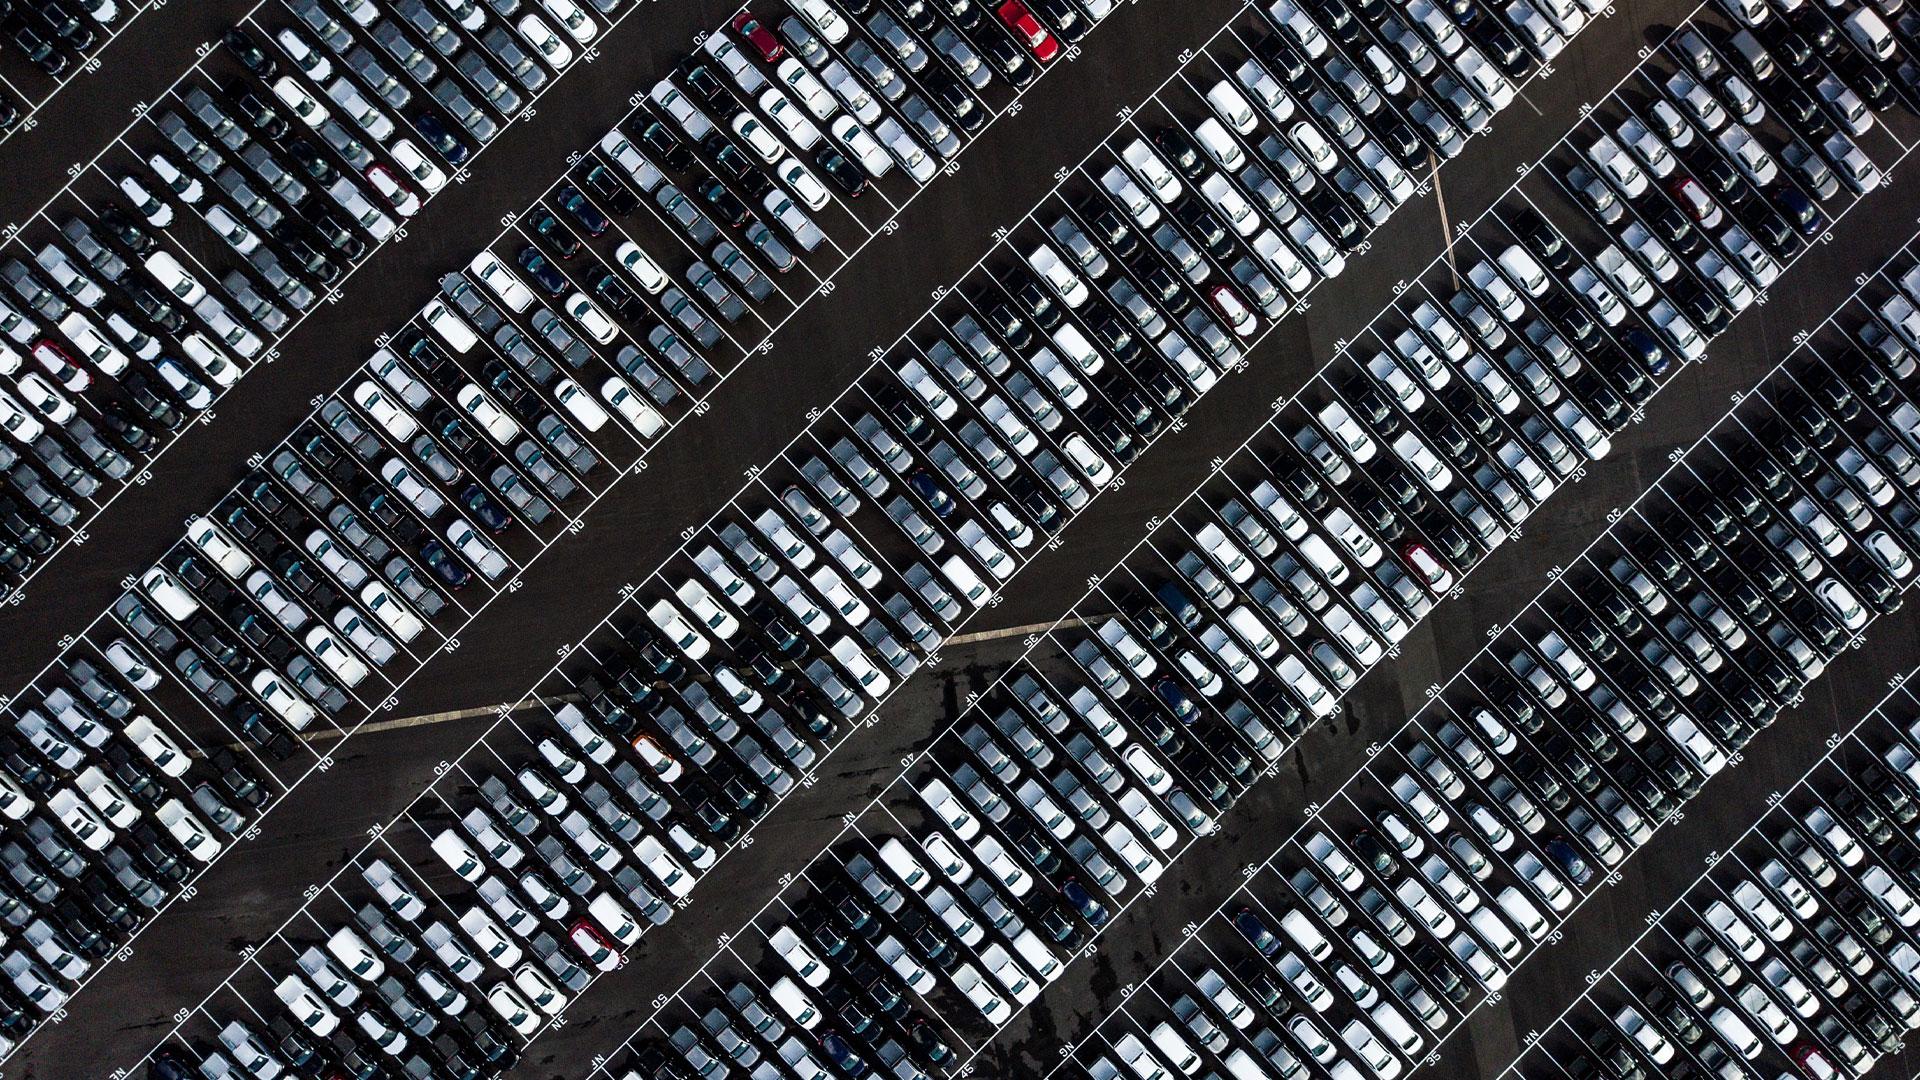 Parkeerplaats van bovenaf gezien in Bristol, Engeland